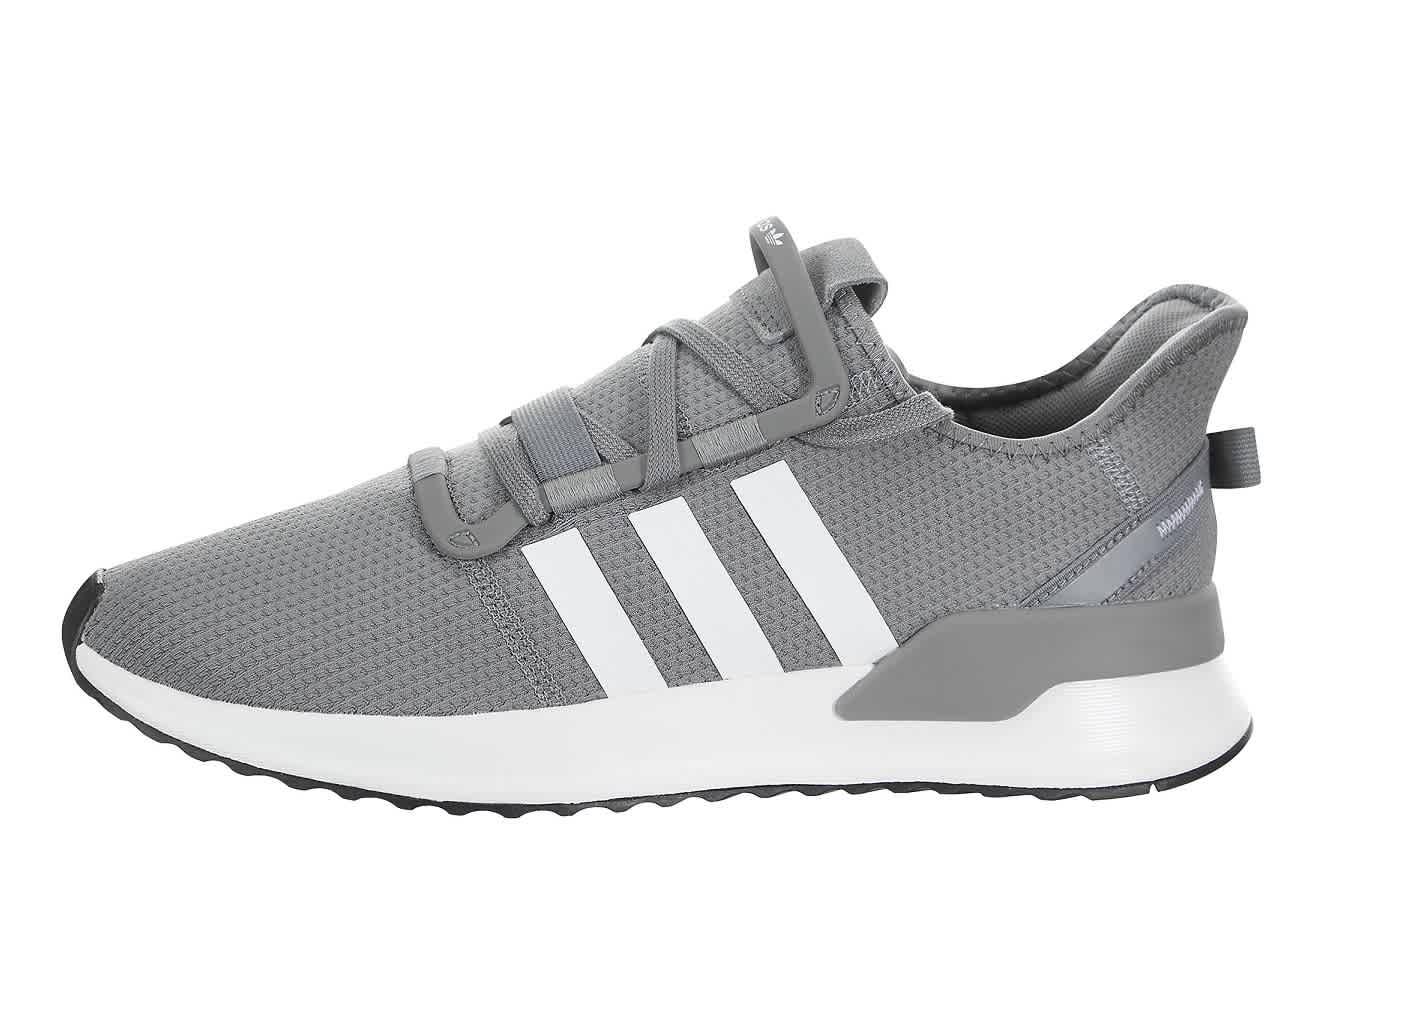 Adidas Men's U-Path Run Sneakers | eBay